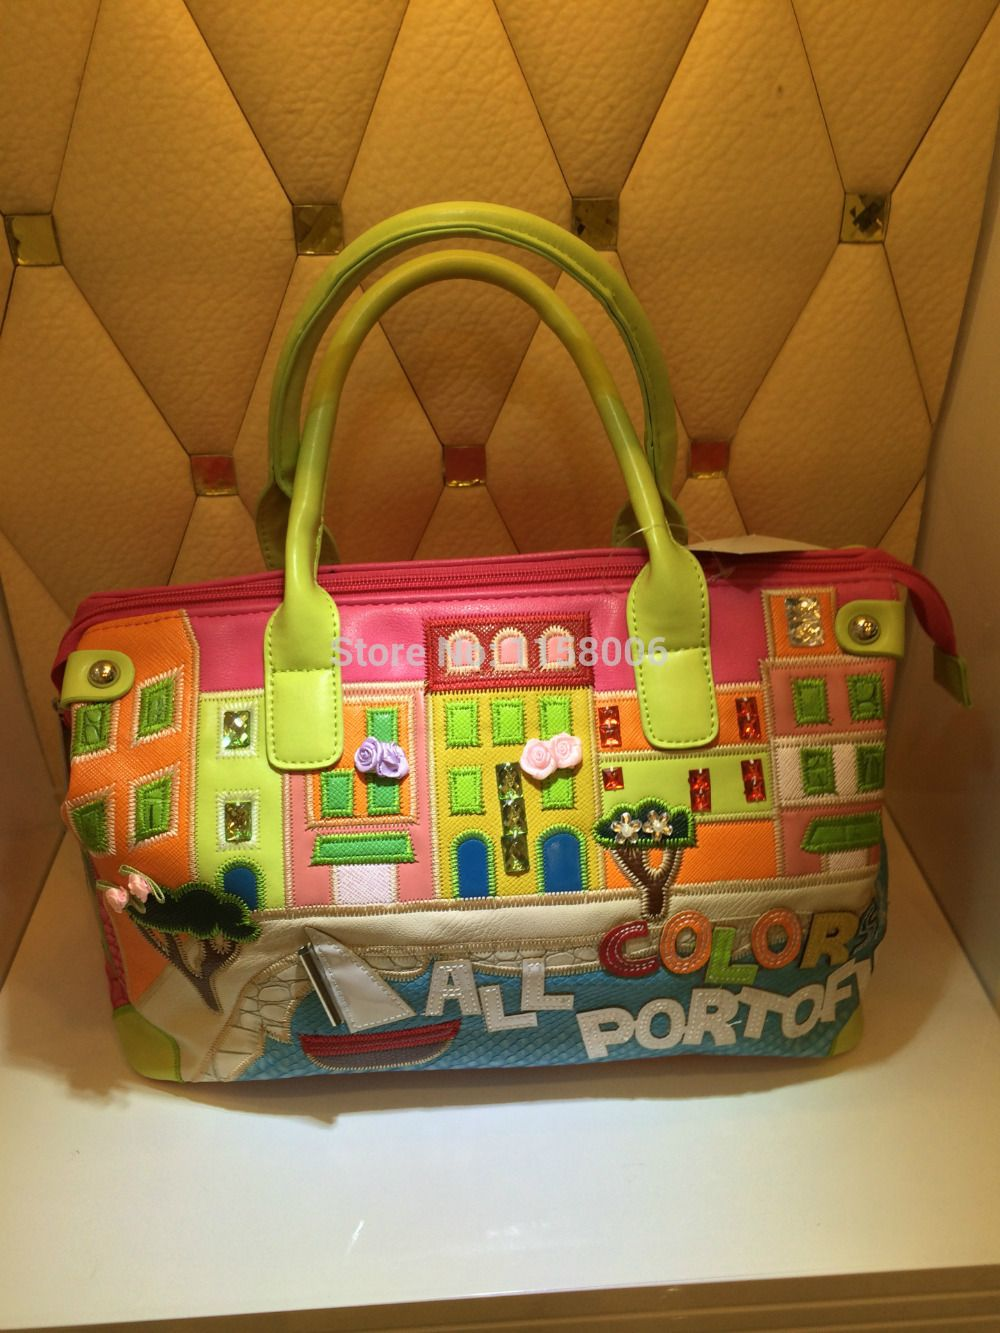 Liques Braccialini Totes Women Handbag Cartoon Kawaii Italy Brands Bags All Color